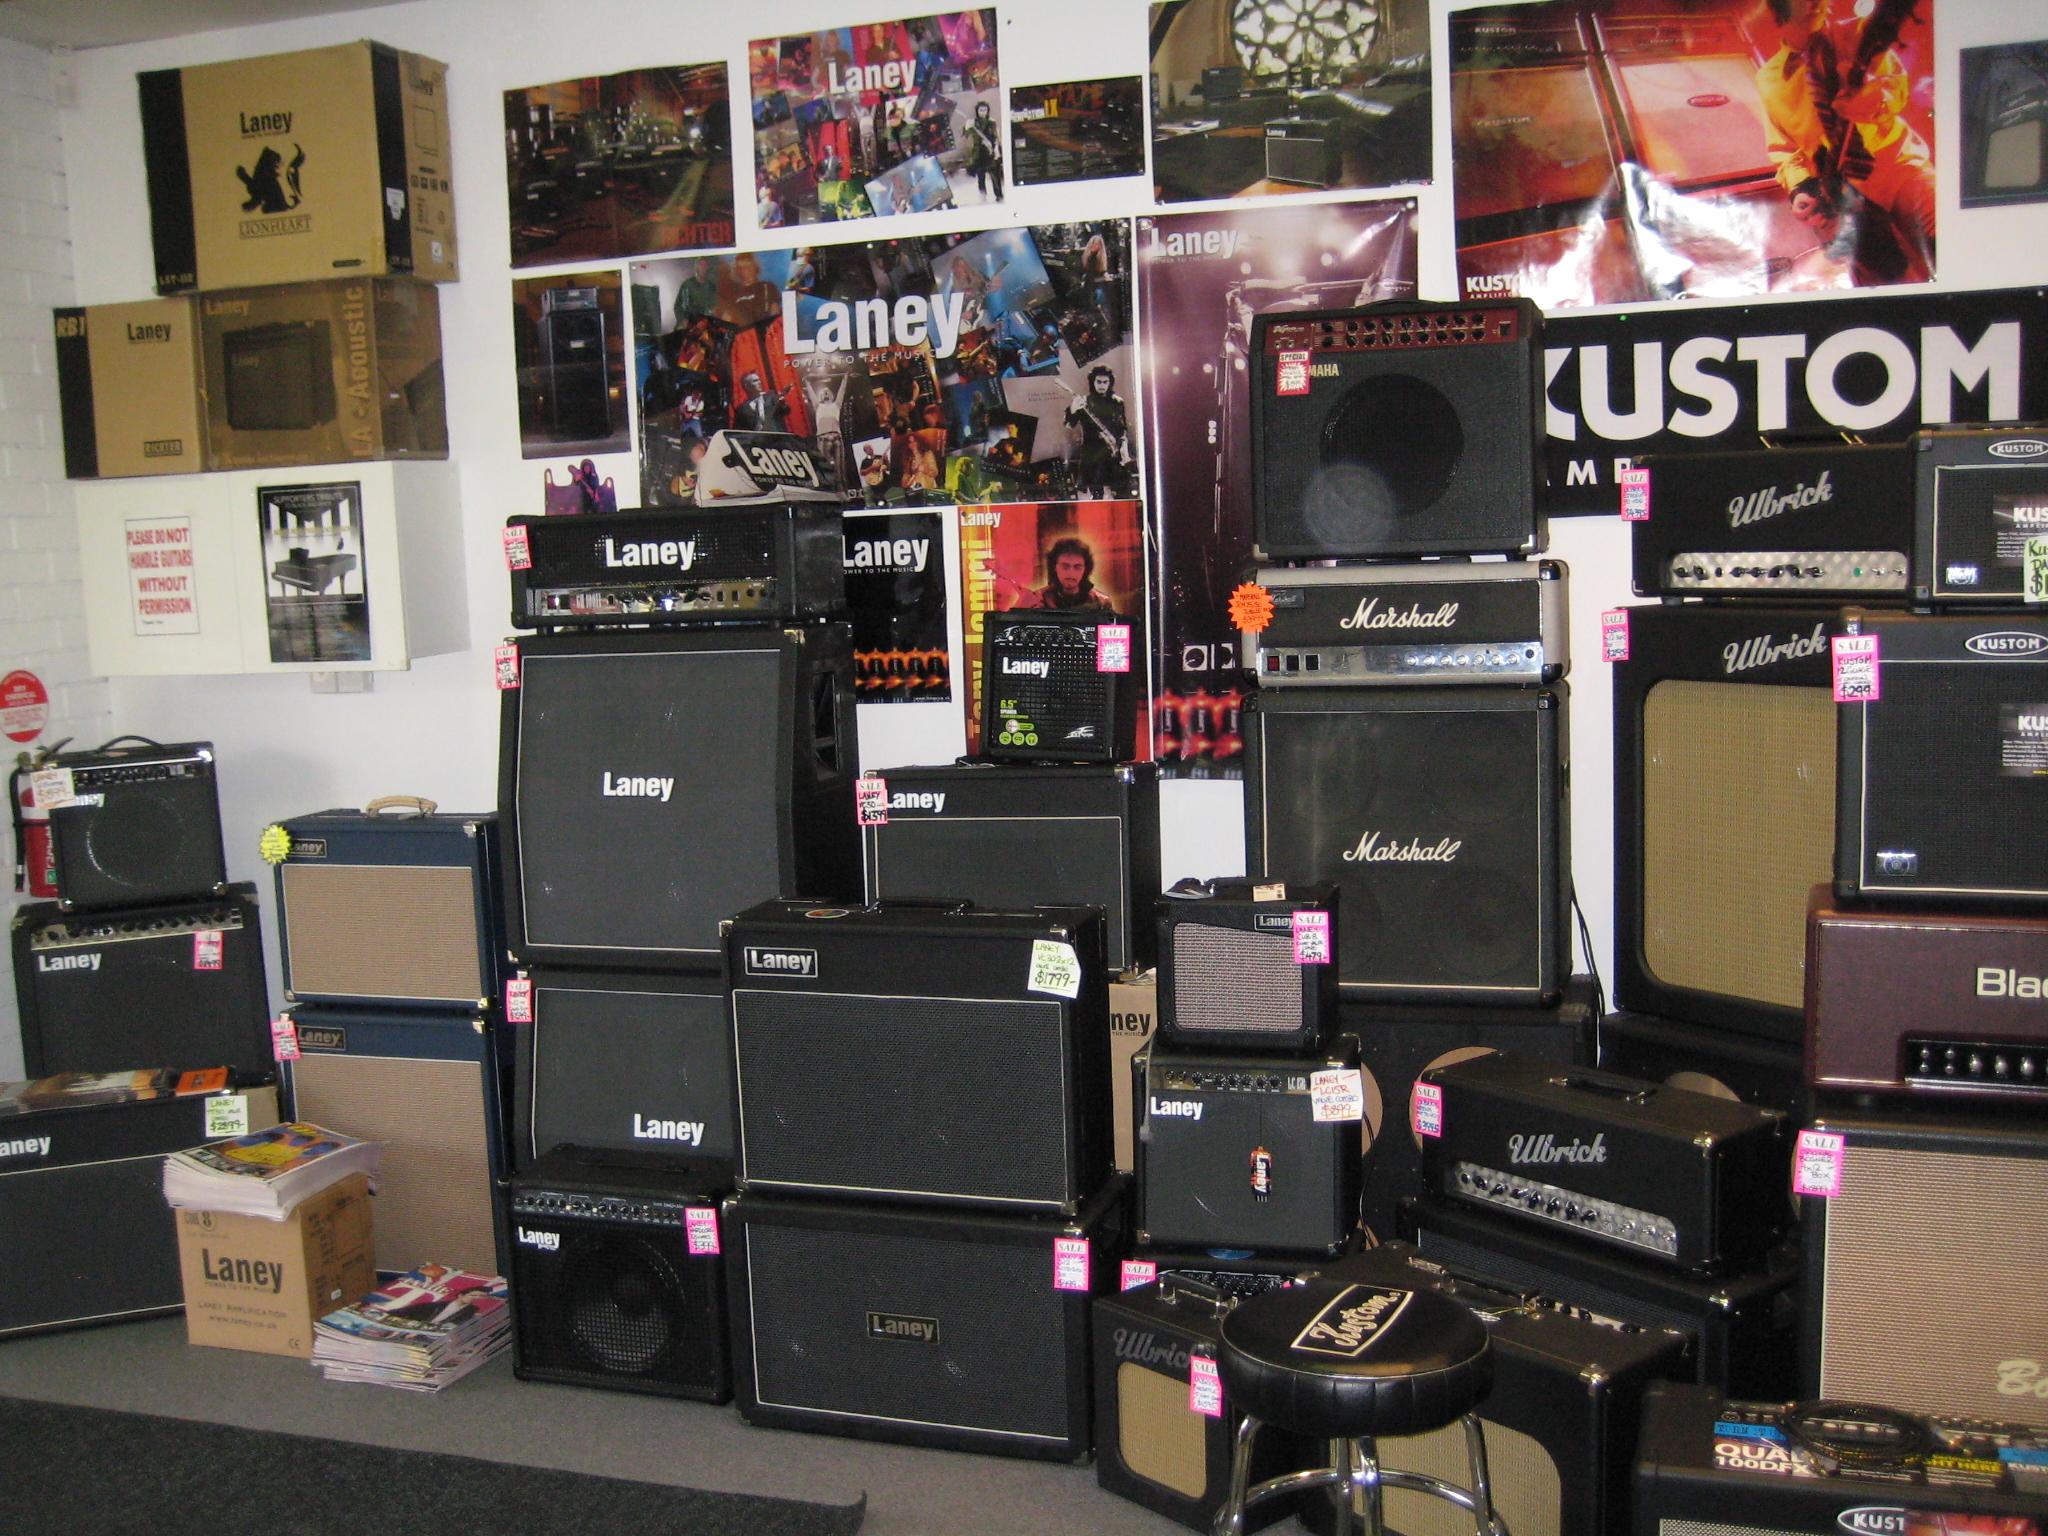 retro amp wall.jpg